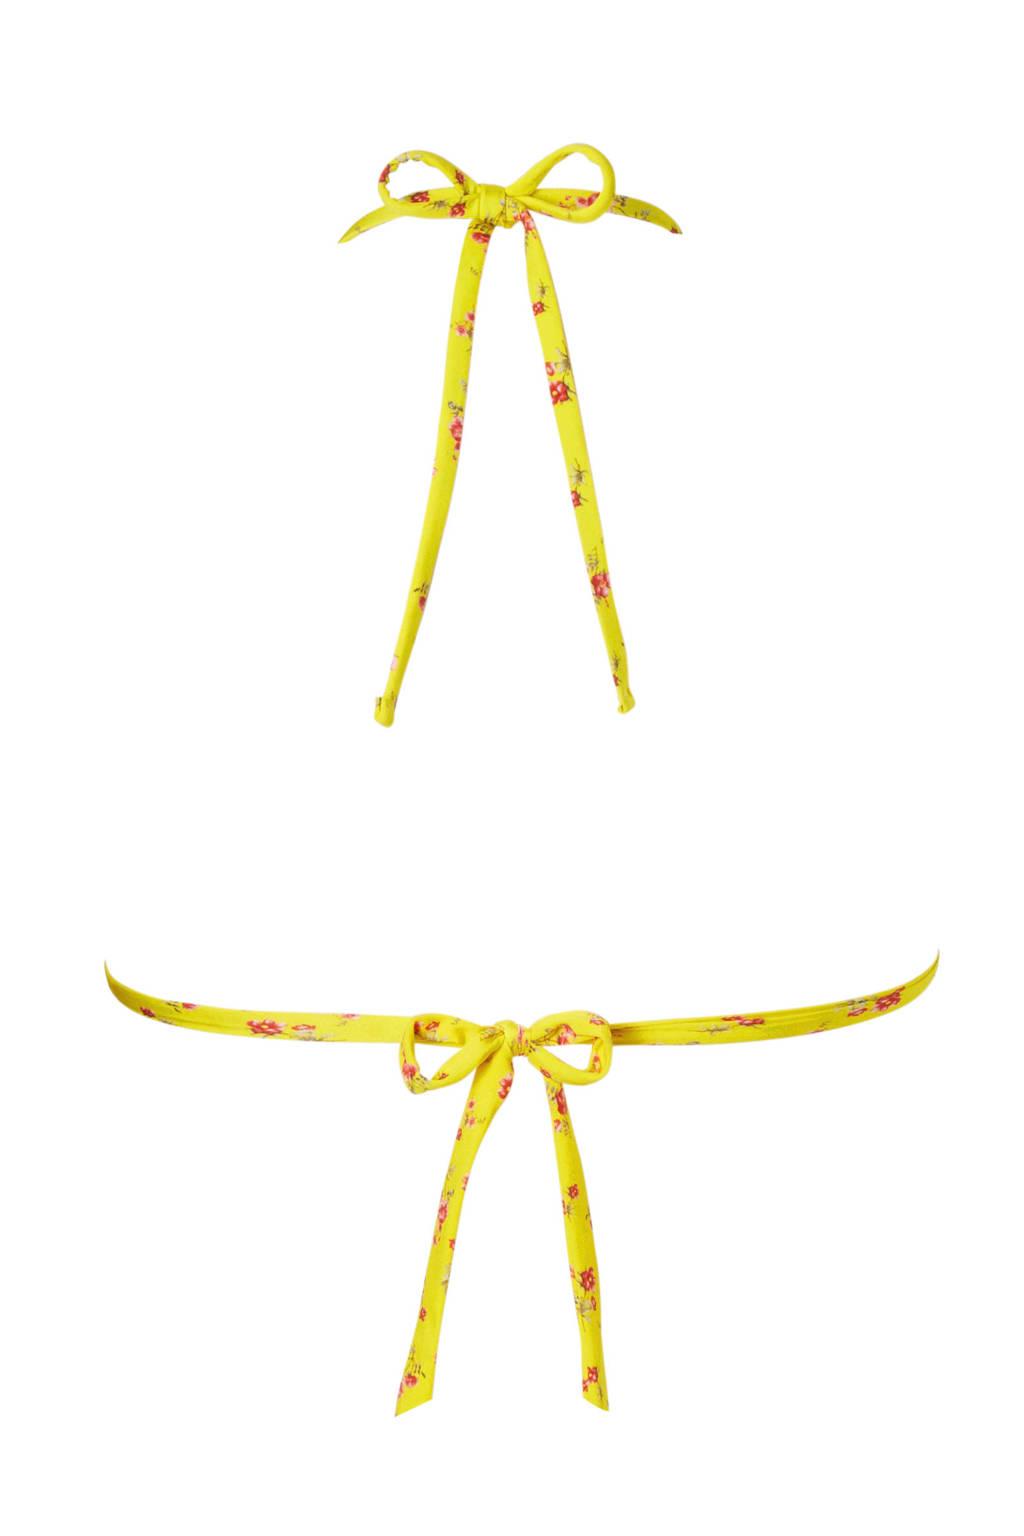 In Print All Geel Moontriangel Bikinitop Banana Over aqFffpx